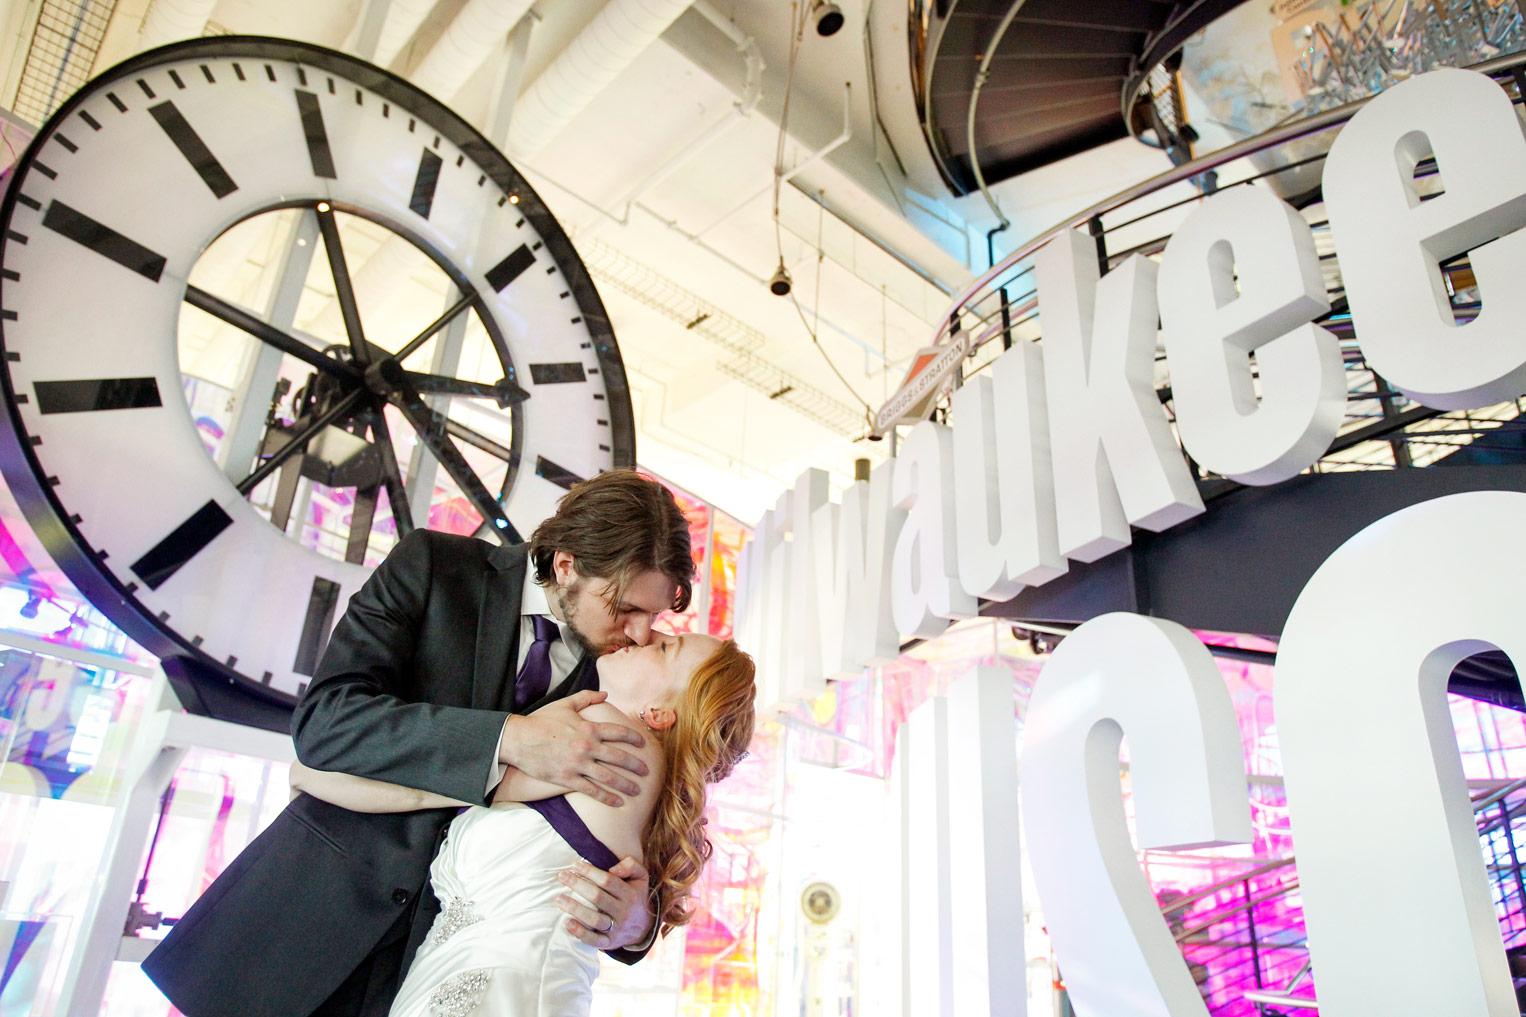 milwaukee-discovery-world-pier-wisconsin-wedding-ruthie-hauge-photography-39.jpg